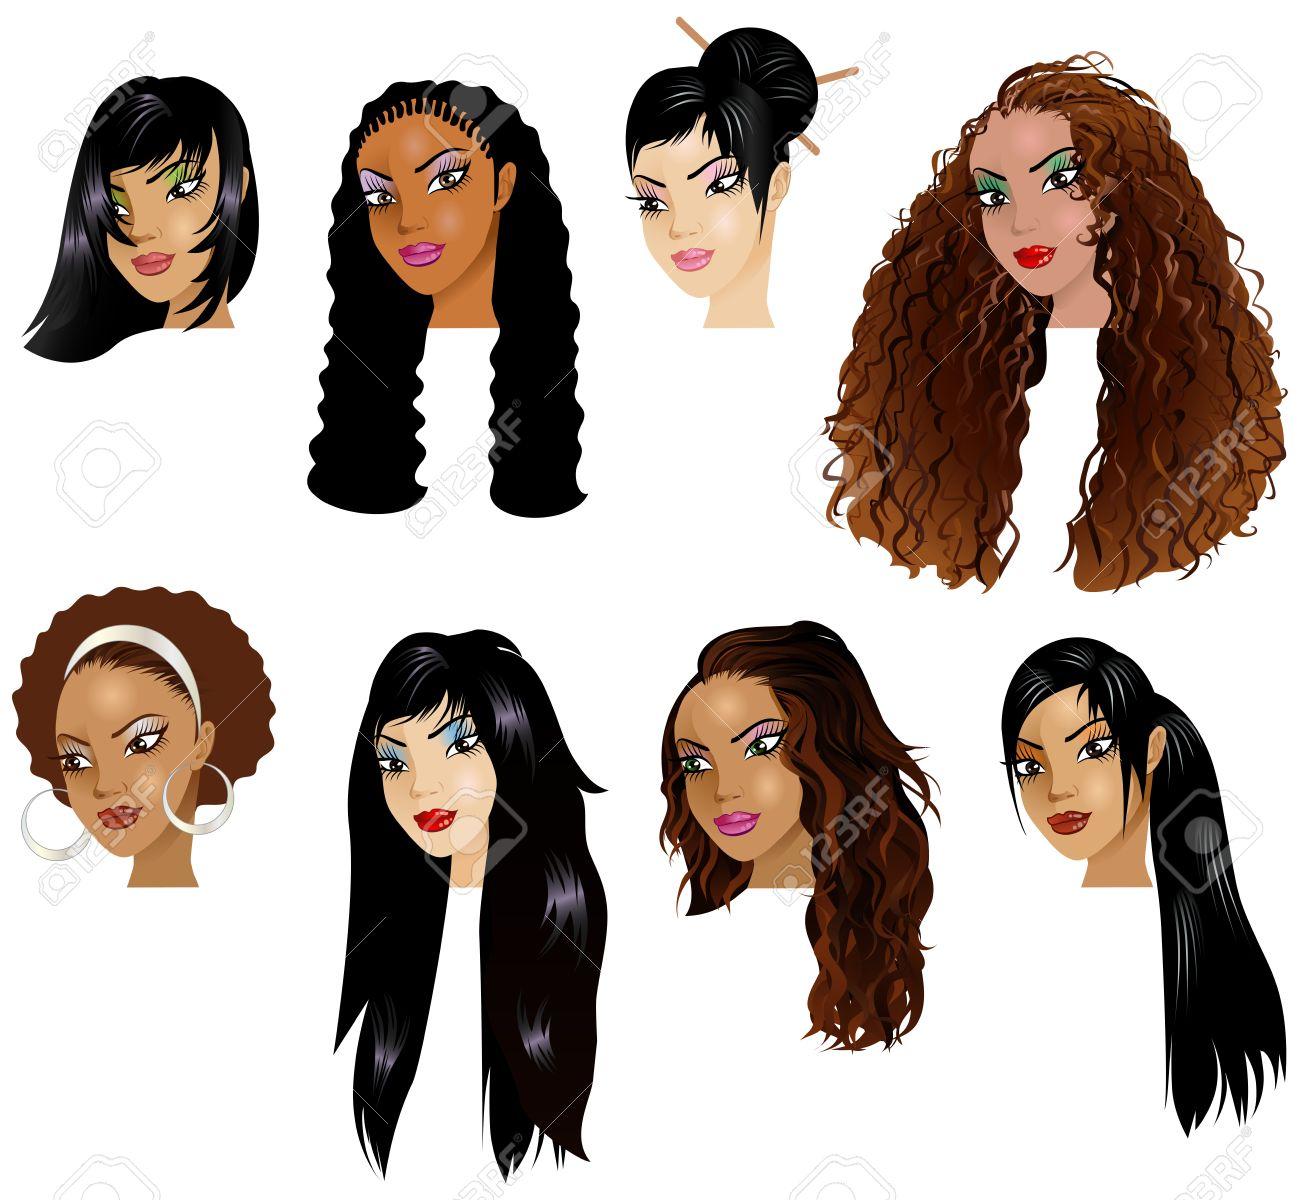 Assorted Haired Vector Illustration Of Hispanic Women Skin Tones Or Hair Styles Illustration Vector Illustration Of Hispanic Women Asian Skin Tone Palette Asian Skin Tone Hex dpreview Asian Skin Tone